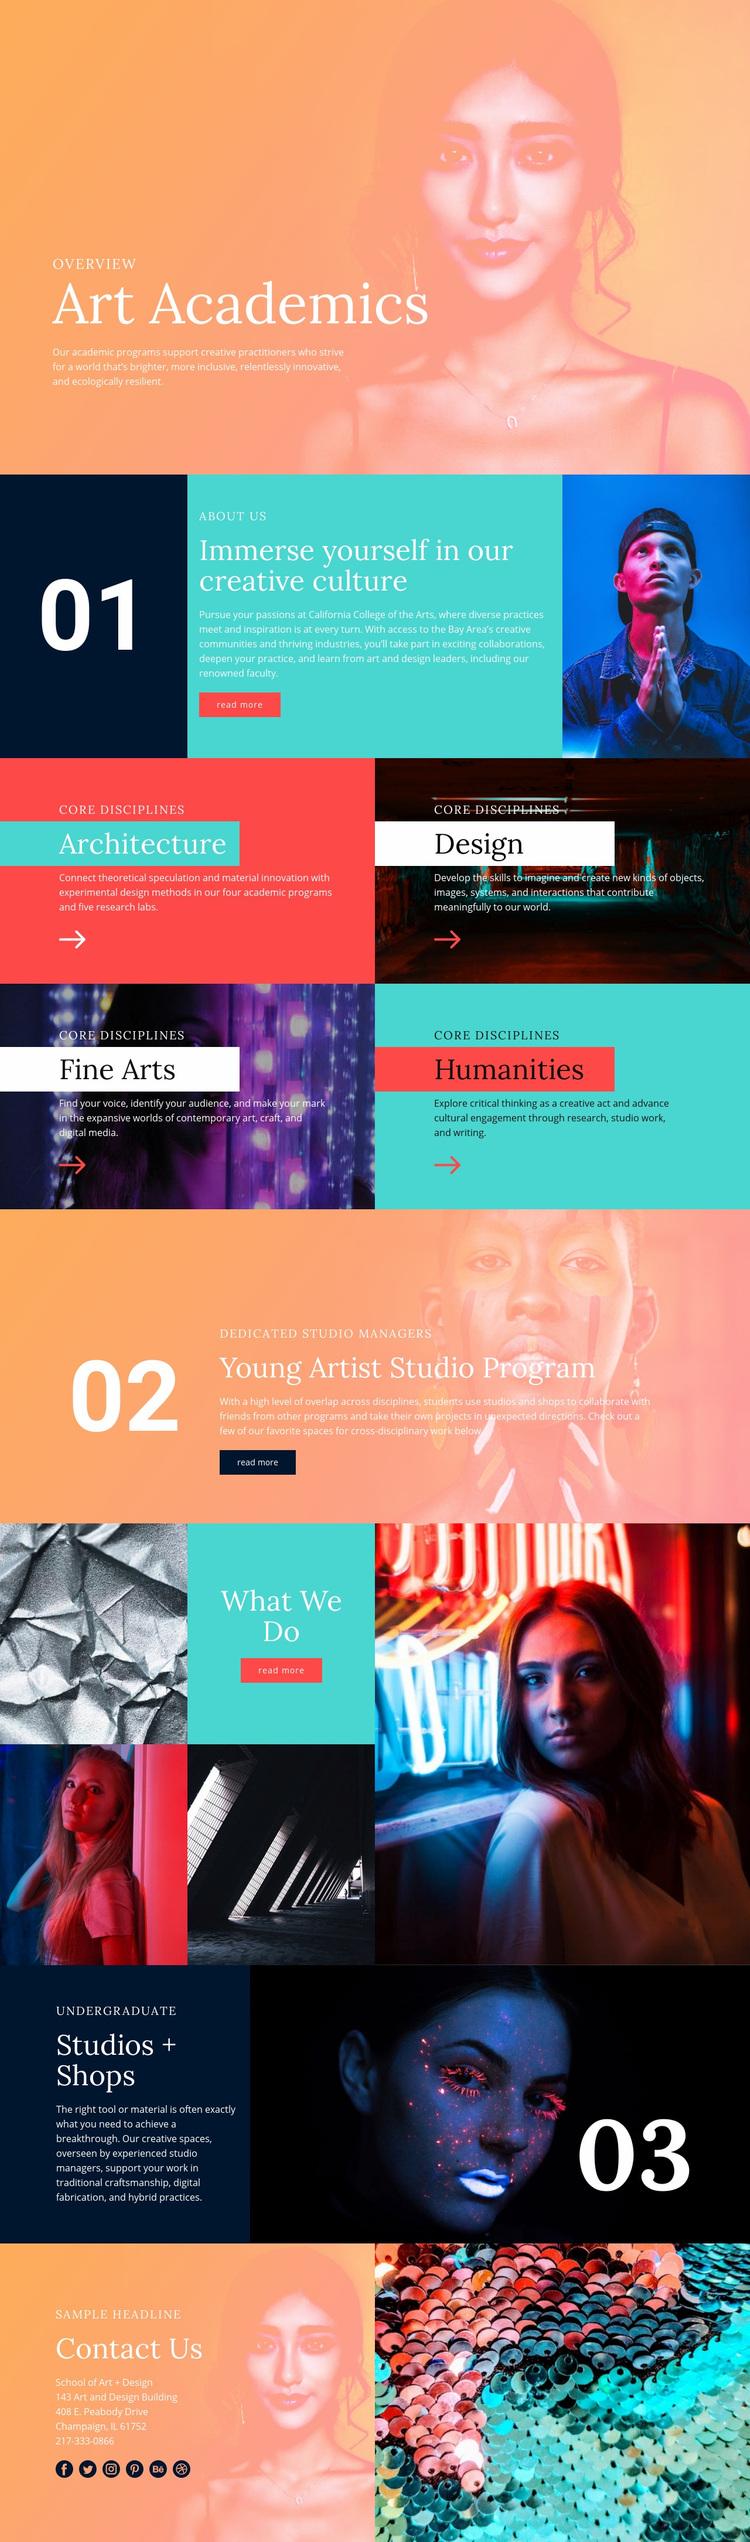 Creative culture in school Web Page Designer